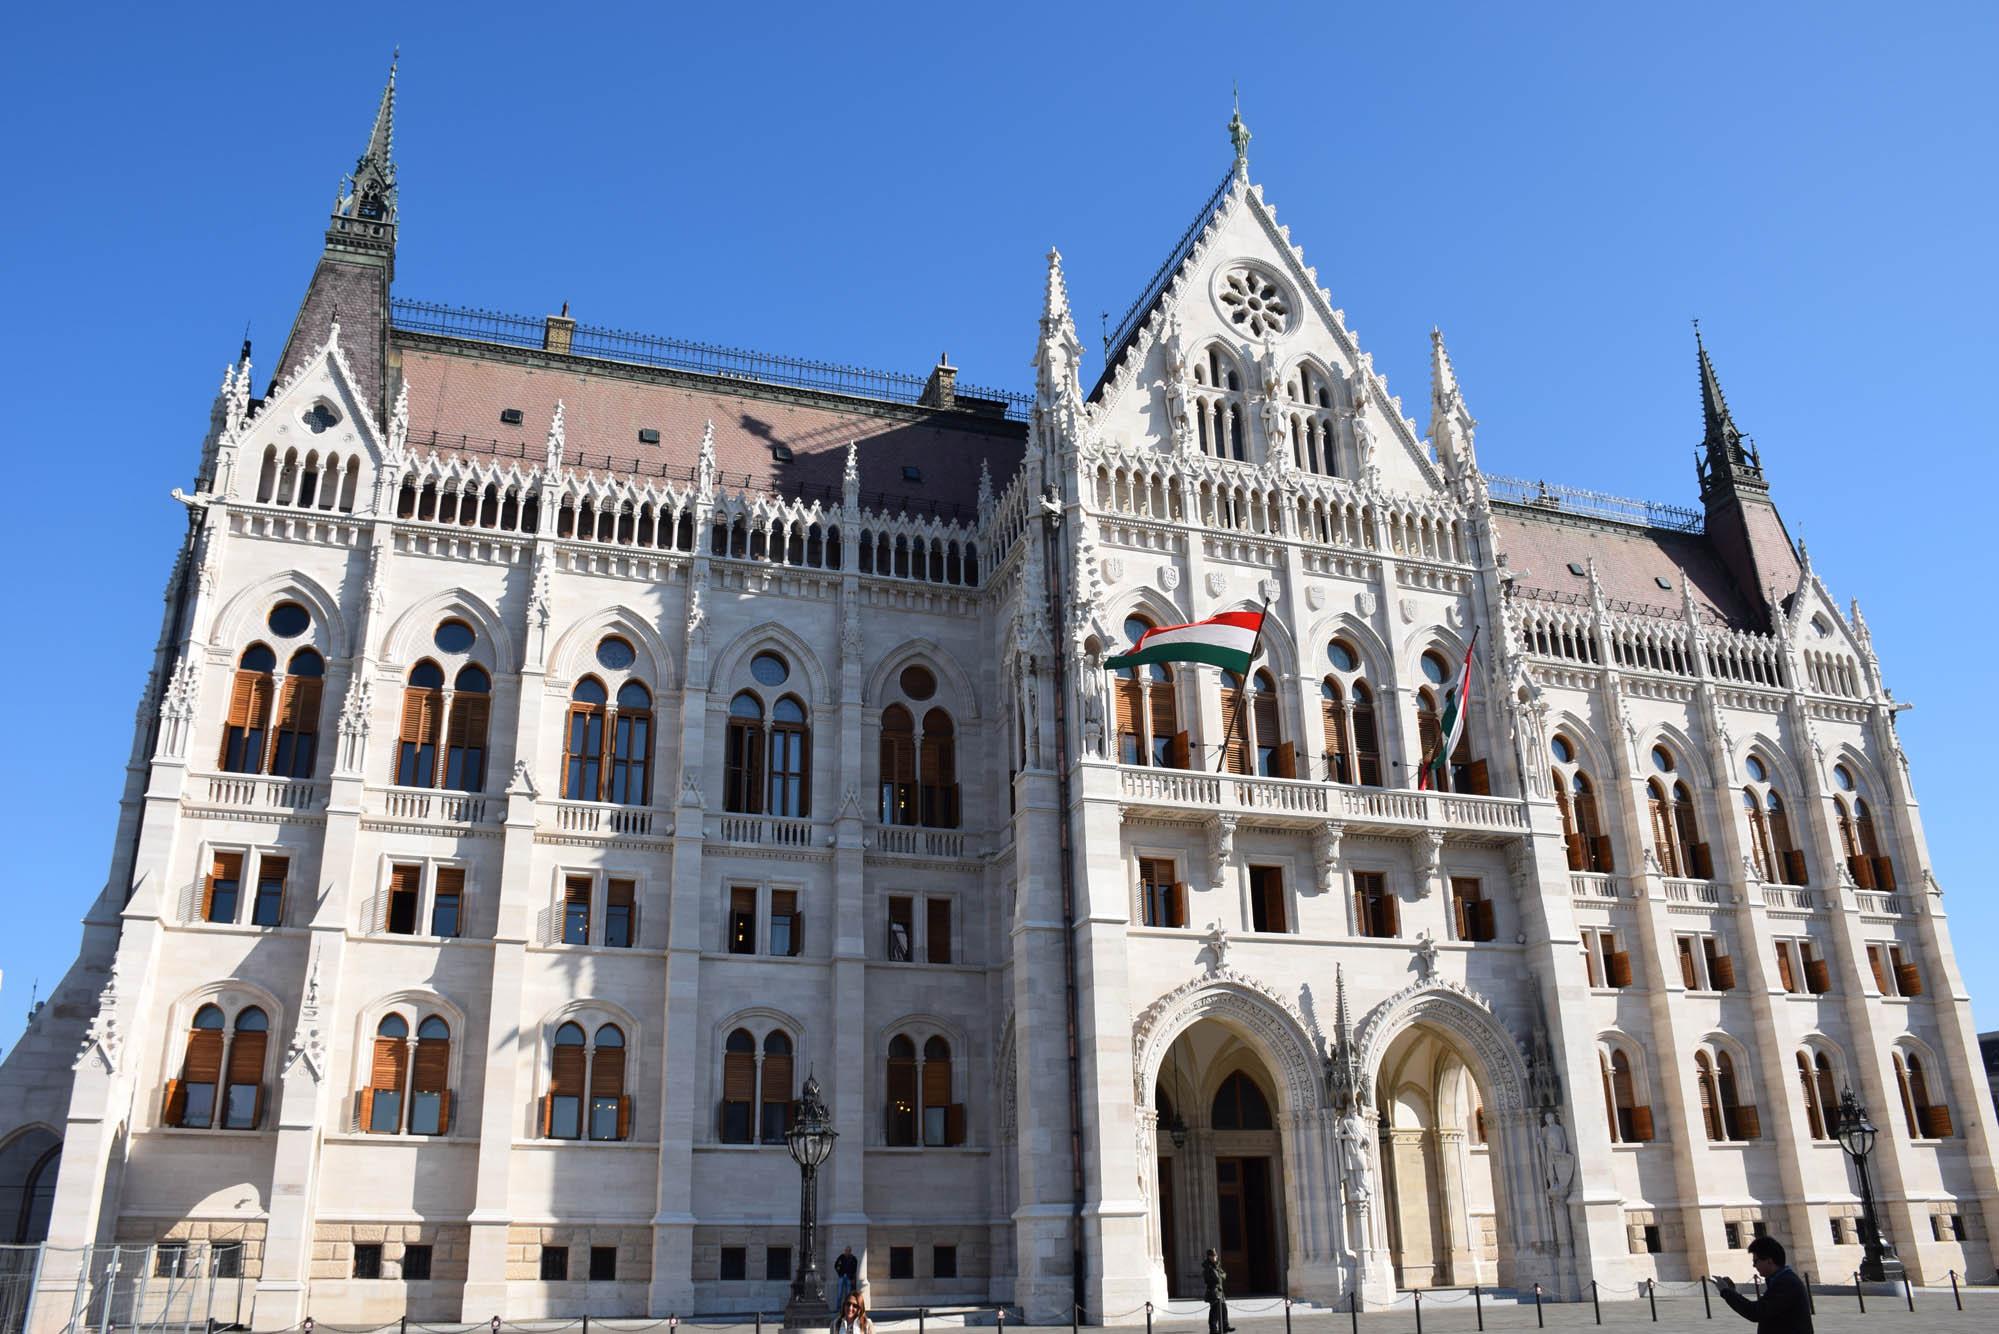 parlamento hungaro - budapeste